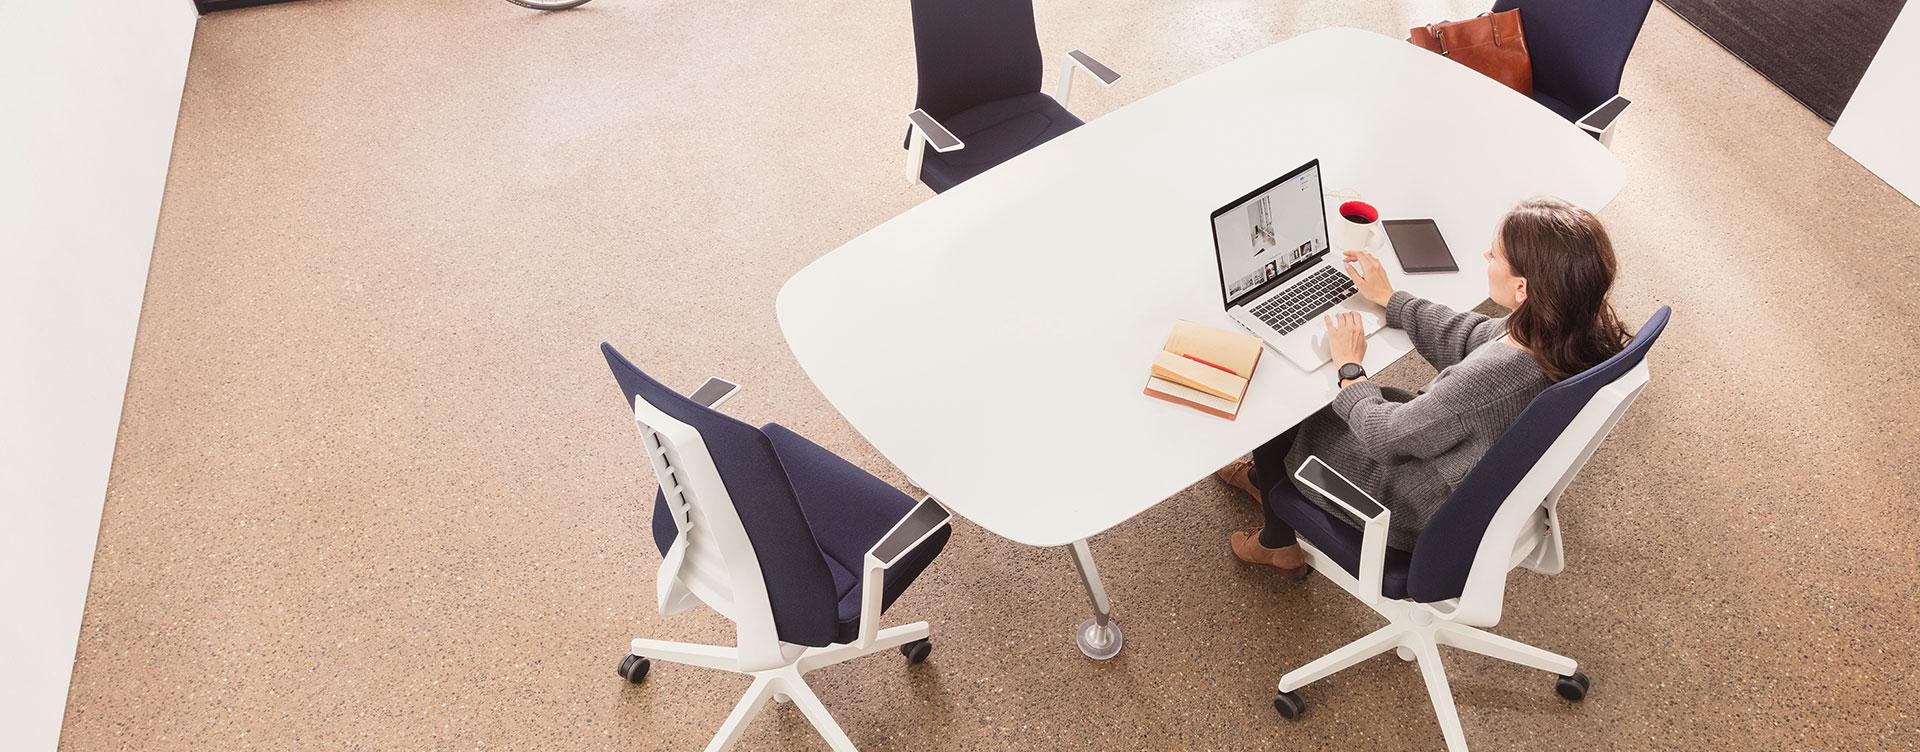 PUREis3 Interstuhl bureaustoel dynamisch zitten smart spring technologie